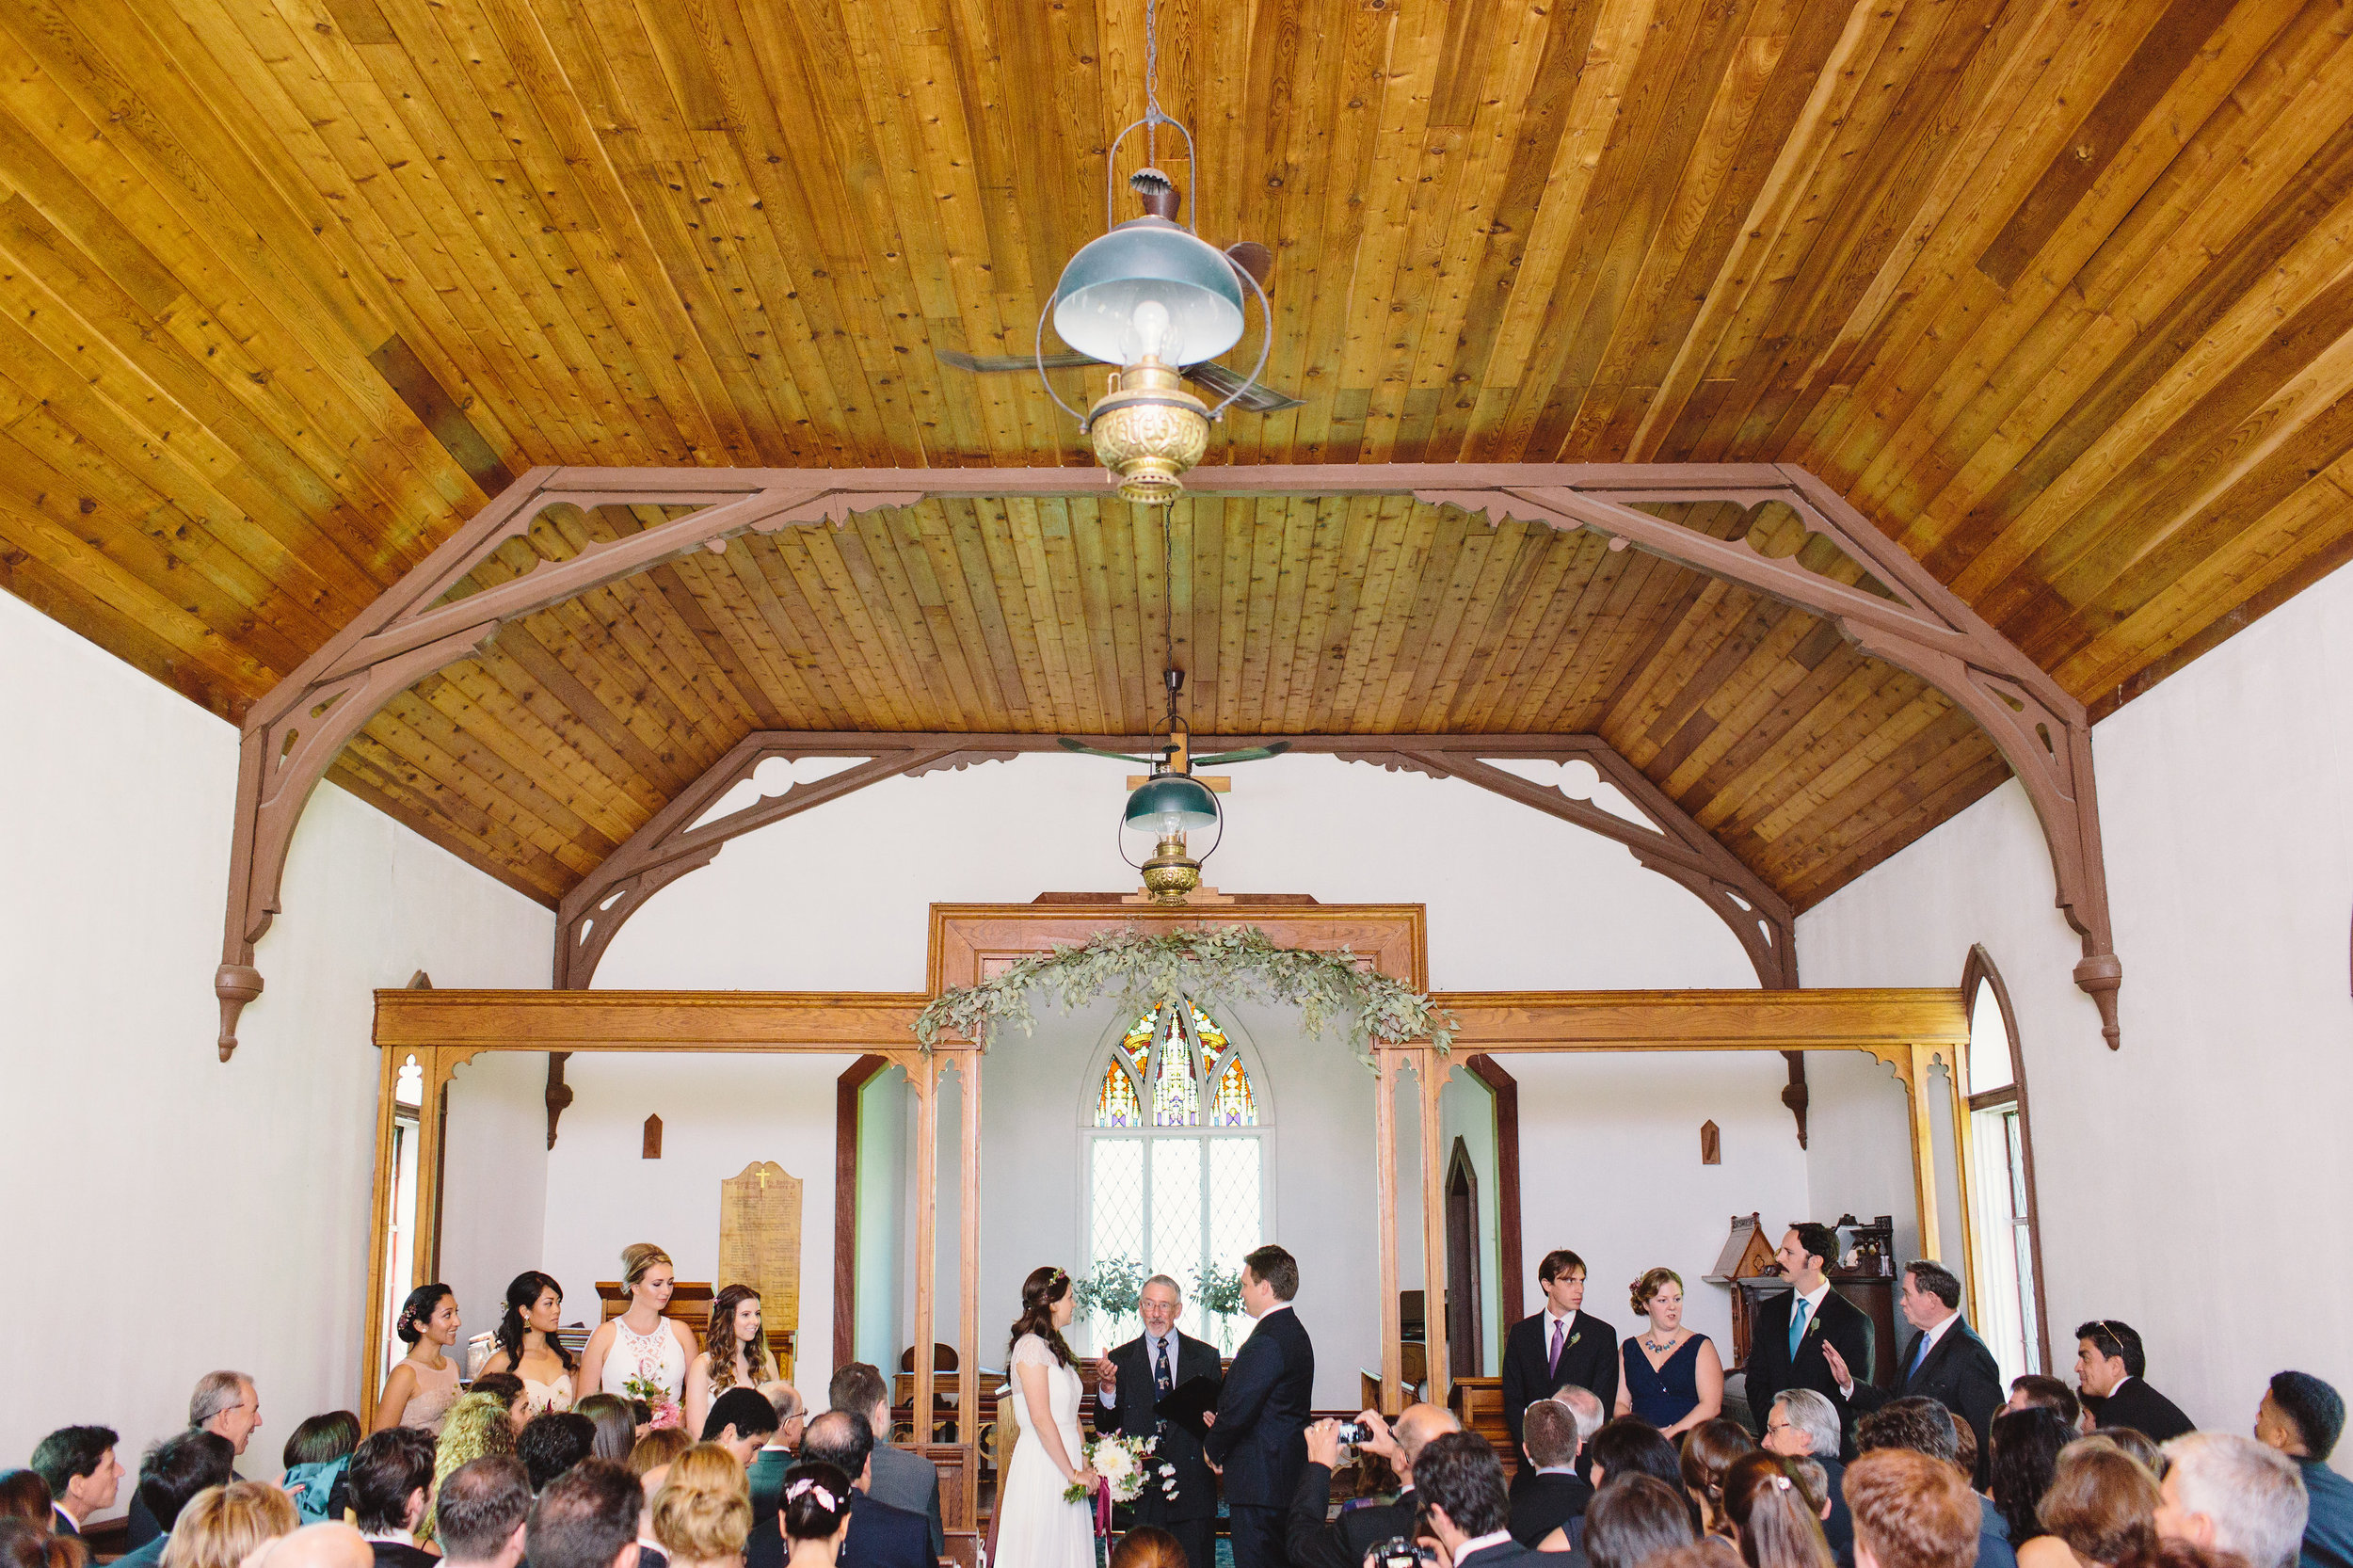 marial-daniel-wedding-balls-falls-sara-wilde-photography-0099.jpg